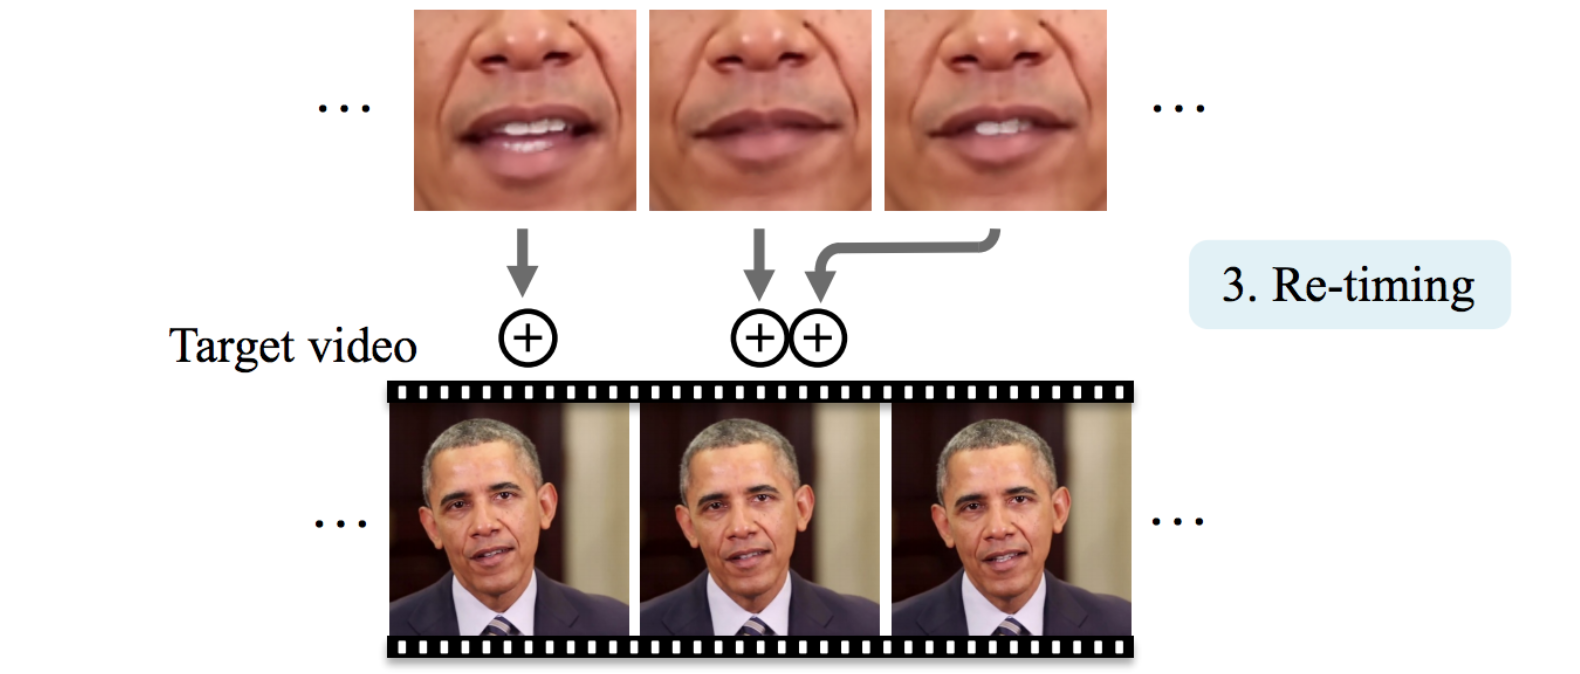 Computer facial graphic reconstruction